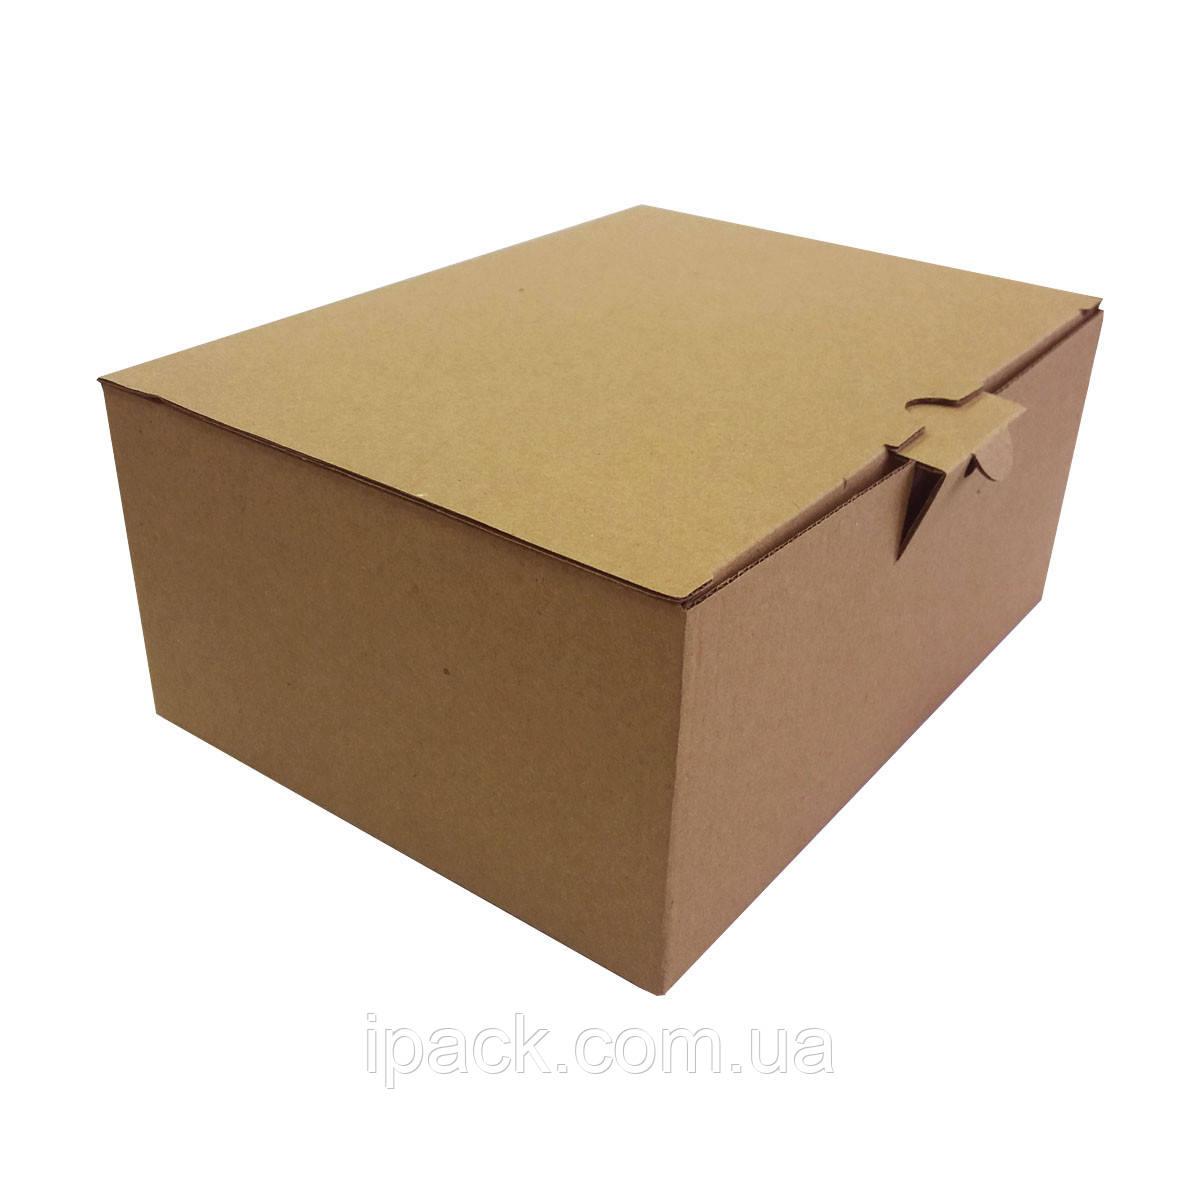 Коробка картонная самосборная, 310*210*100, мм, бурая, крафт, микрогофрокартон